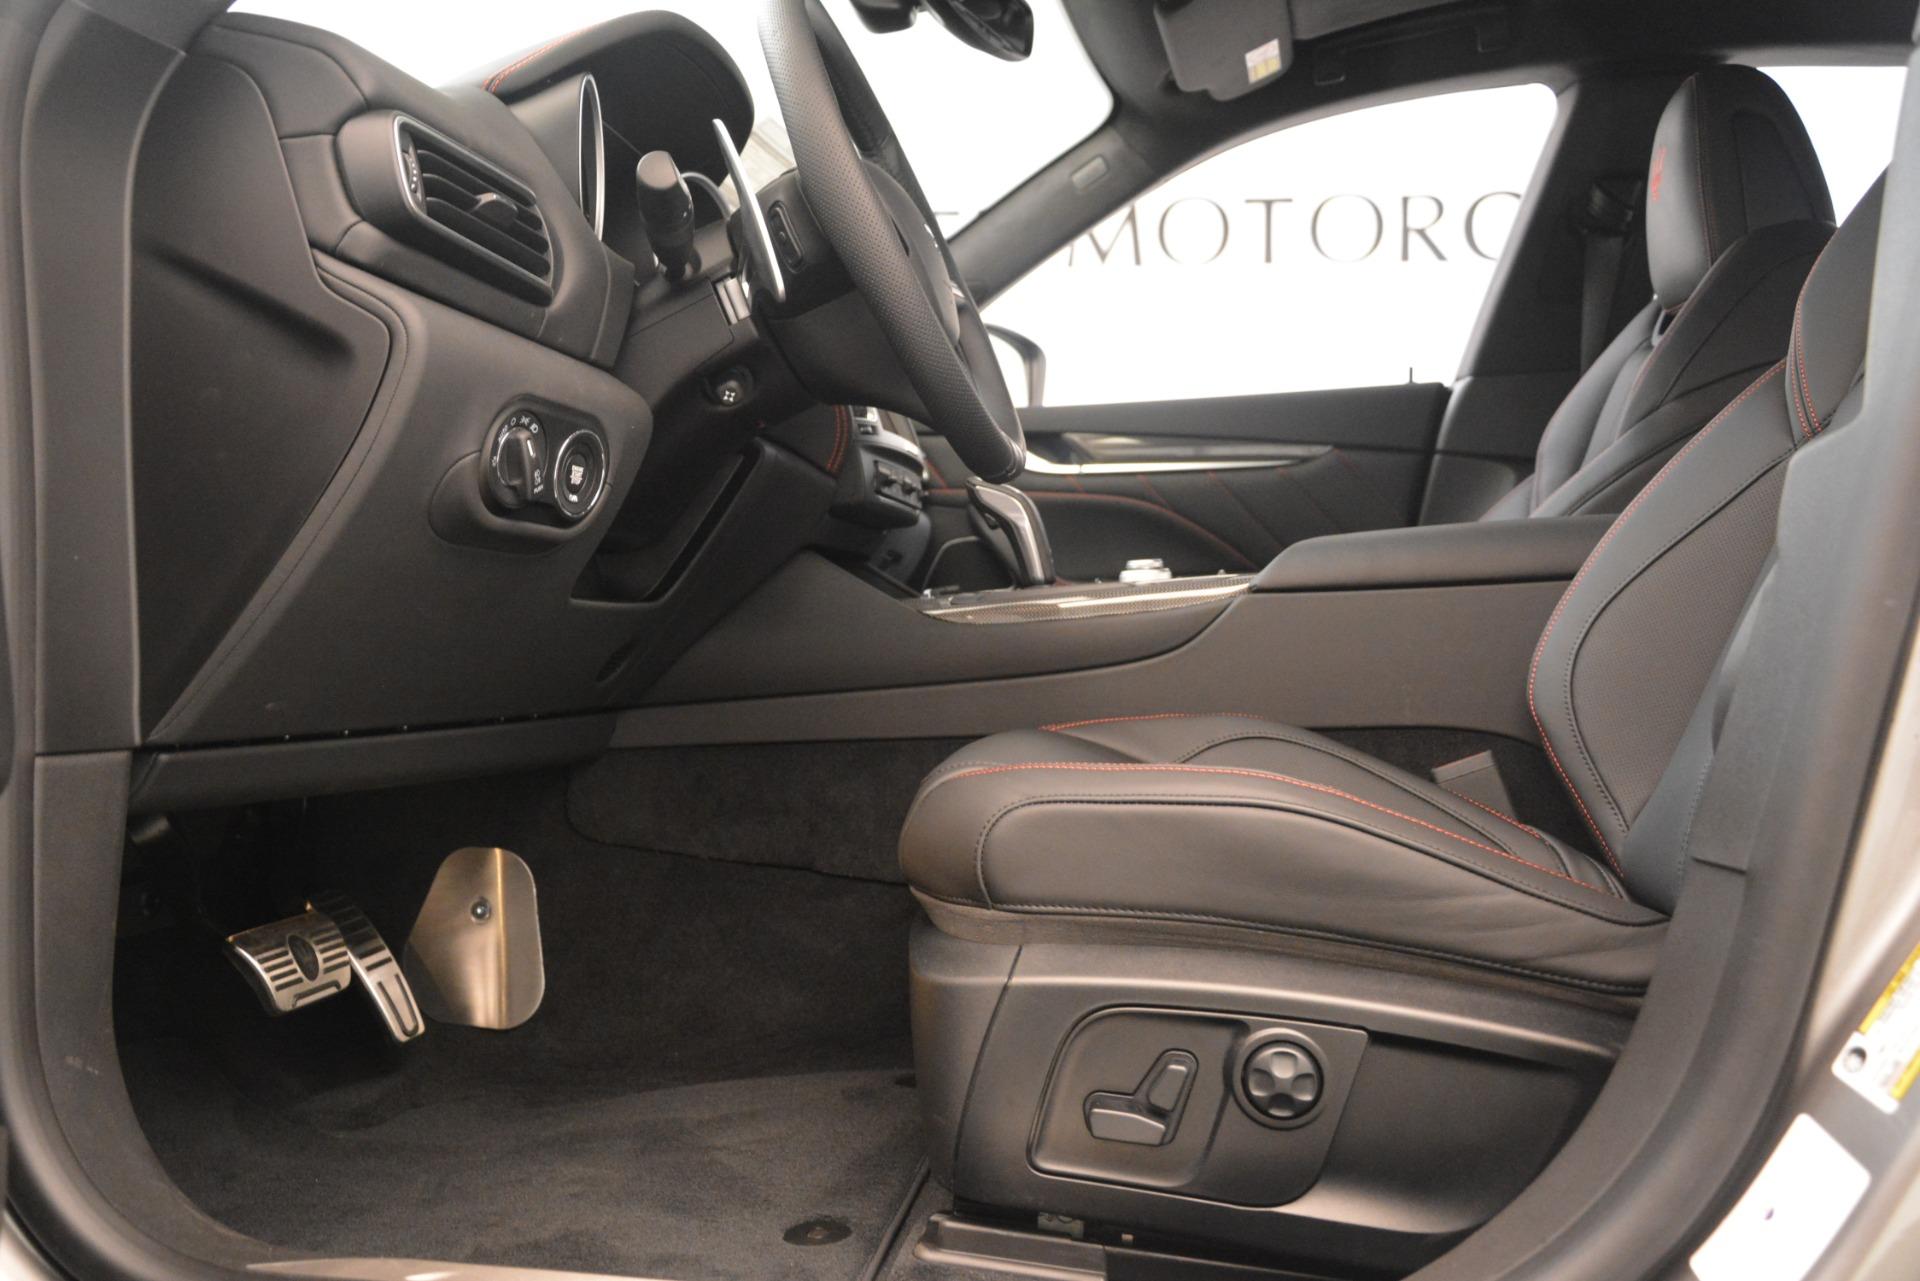 New 2019 Maserati Levante SQ4 GranSport Nerissimo For Sale In Westport, CT 3177_p14